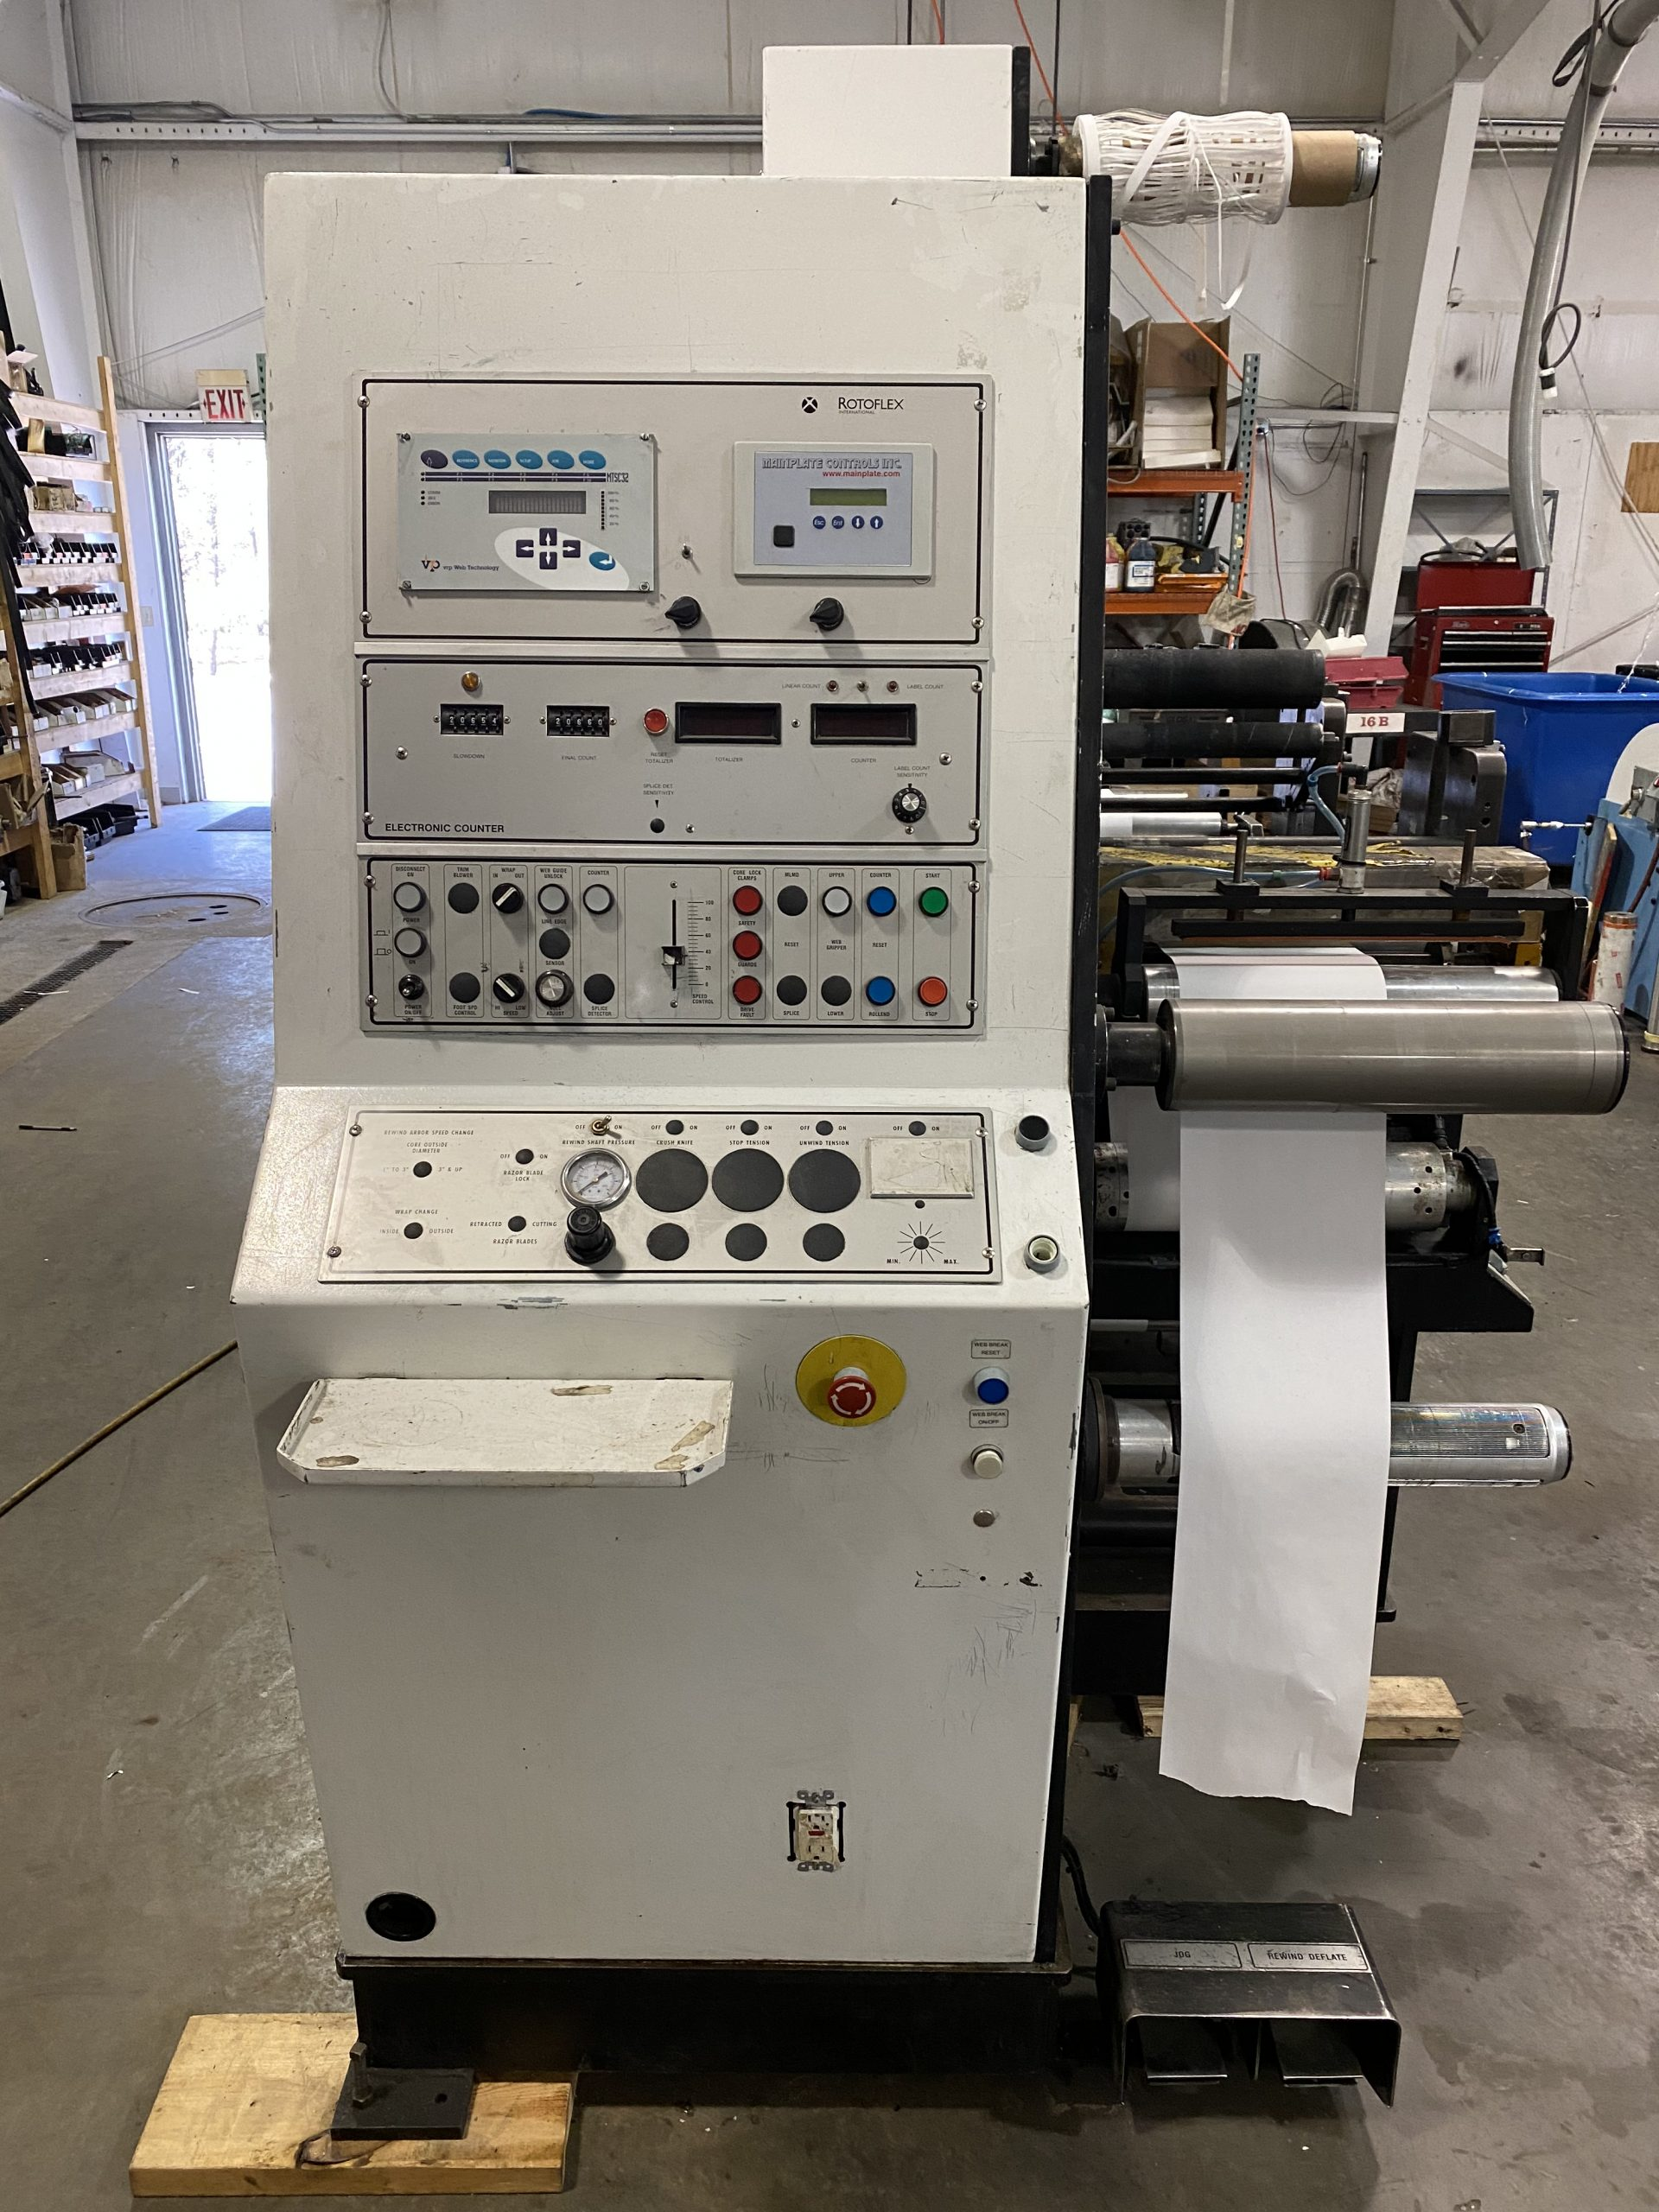 Rotoflex DLI330 - Used Flexo Printing Presses and Used Flexographic Equipment-14